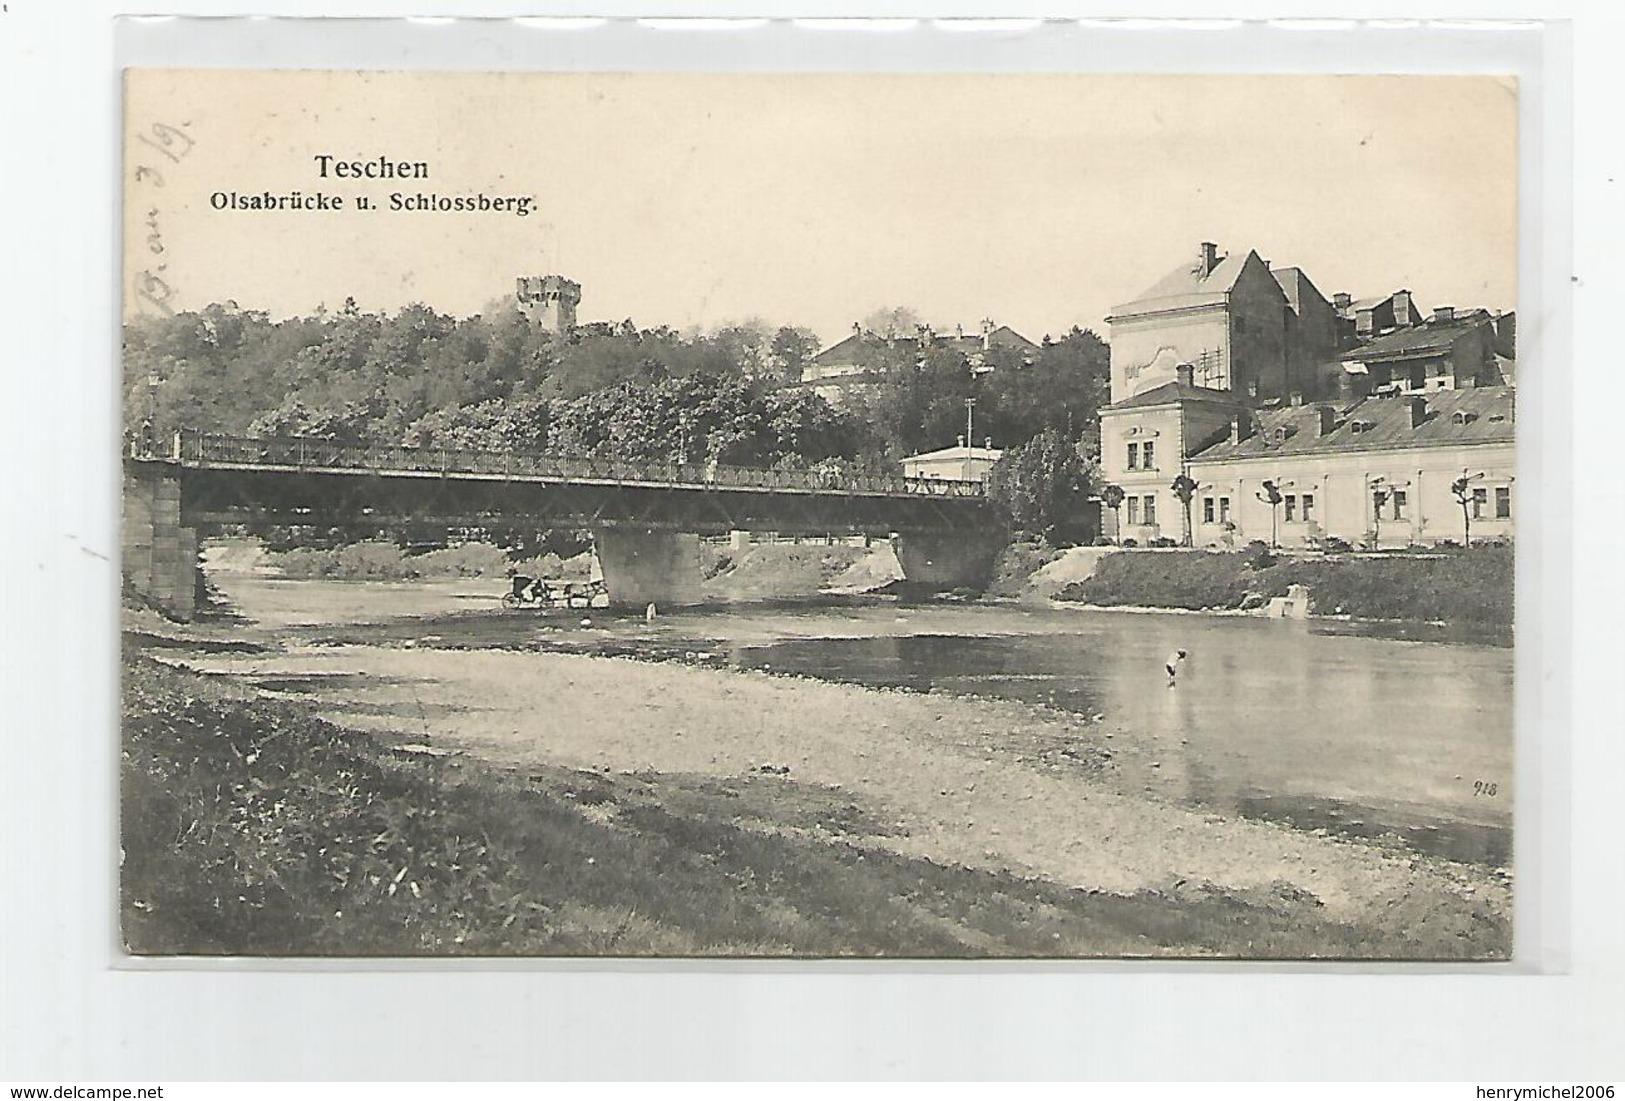 Pologne Poland Teschen Olsabrucke Schlossberg , Timbre 10 Heller Autrichien 1908 - Polen